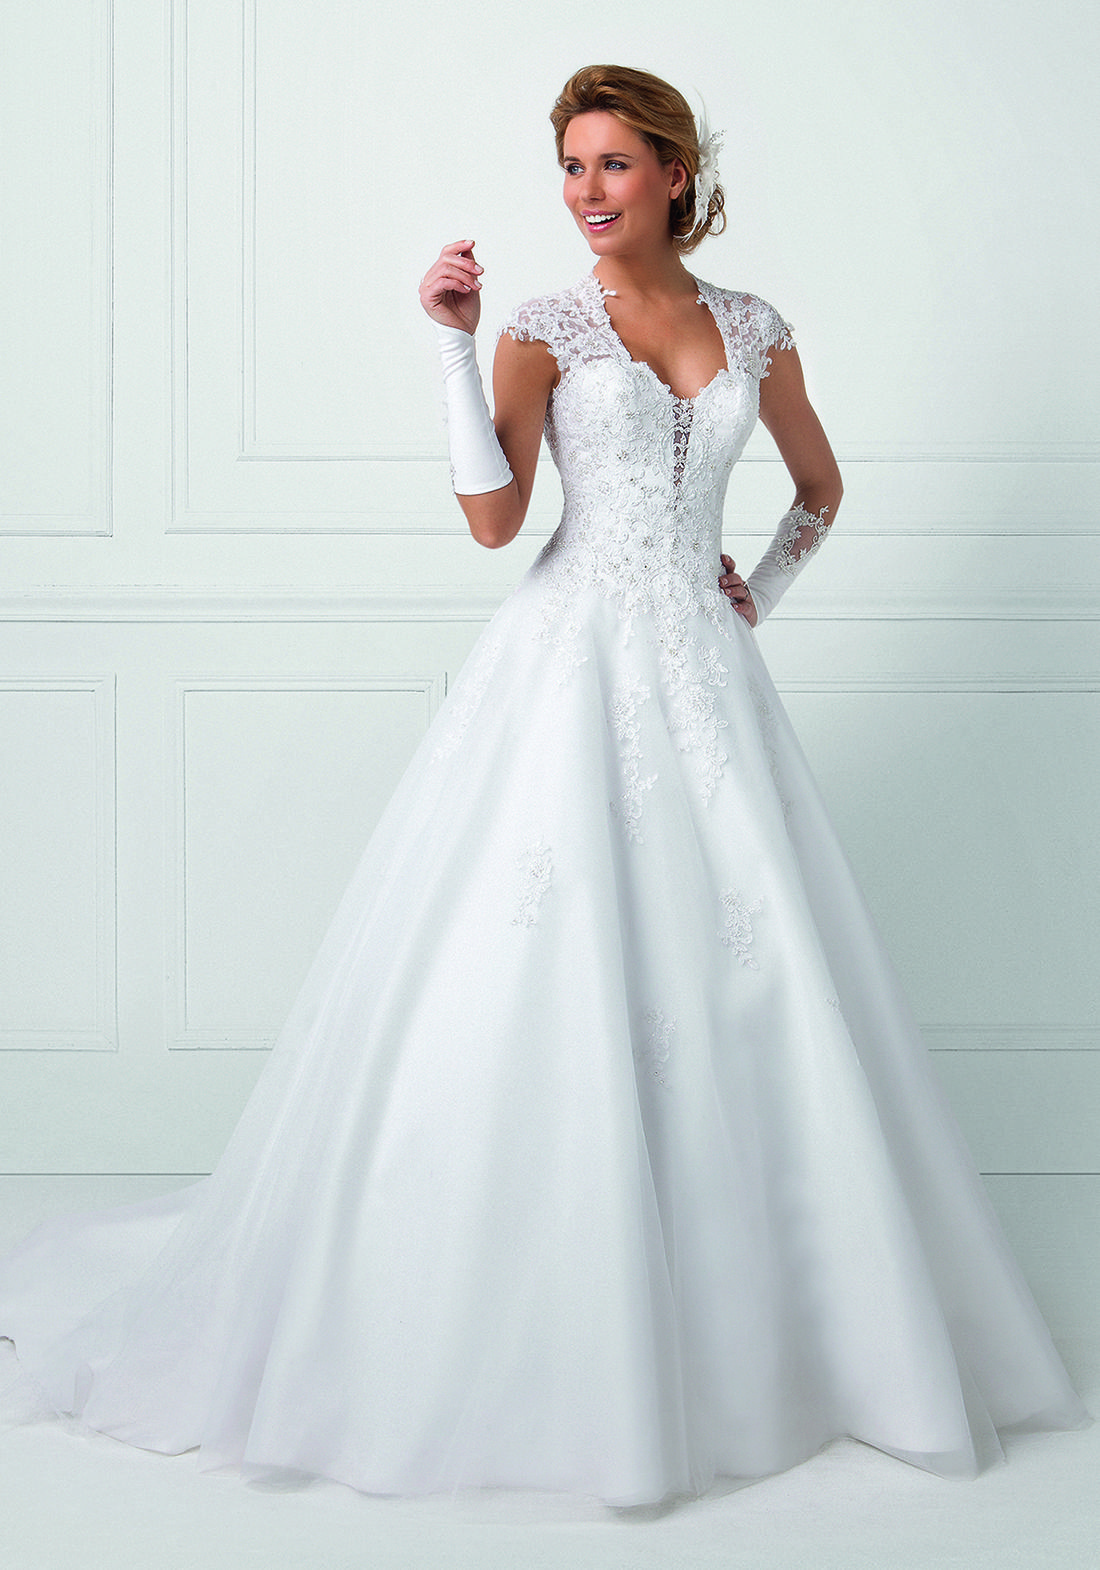 Robe de mariée - Bella - Romantique | Mariage | Pinterest | Bridal ...